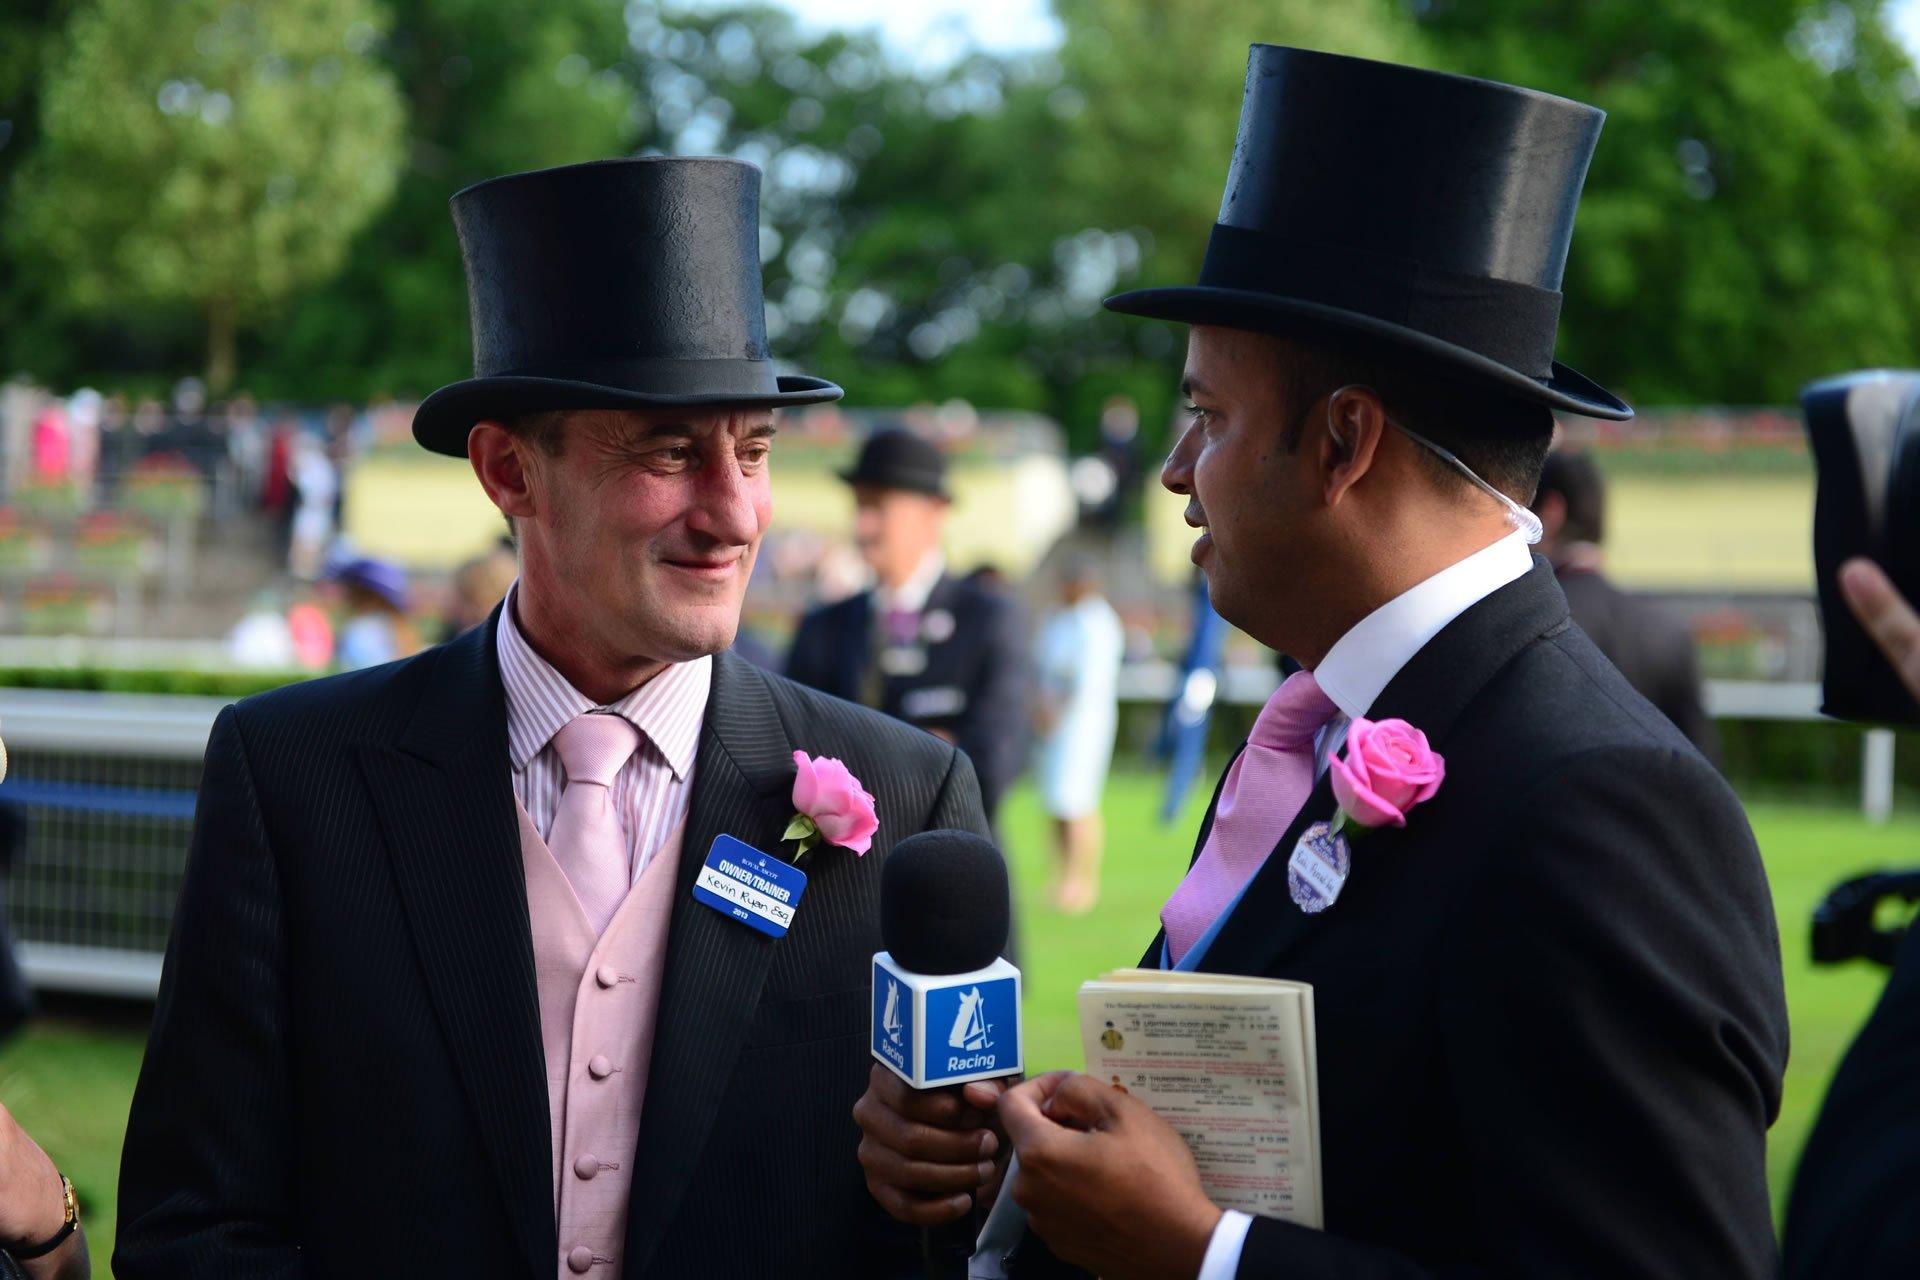 Kevin Ryan Royal Ascot win Hambleton's horse racing syndicate